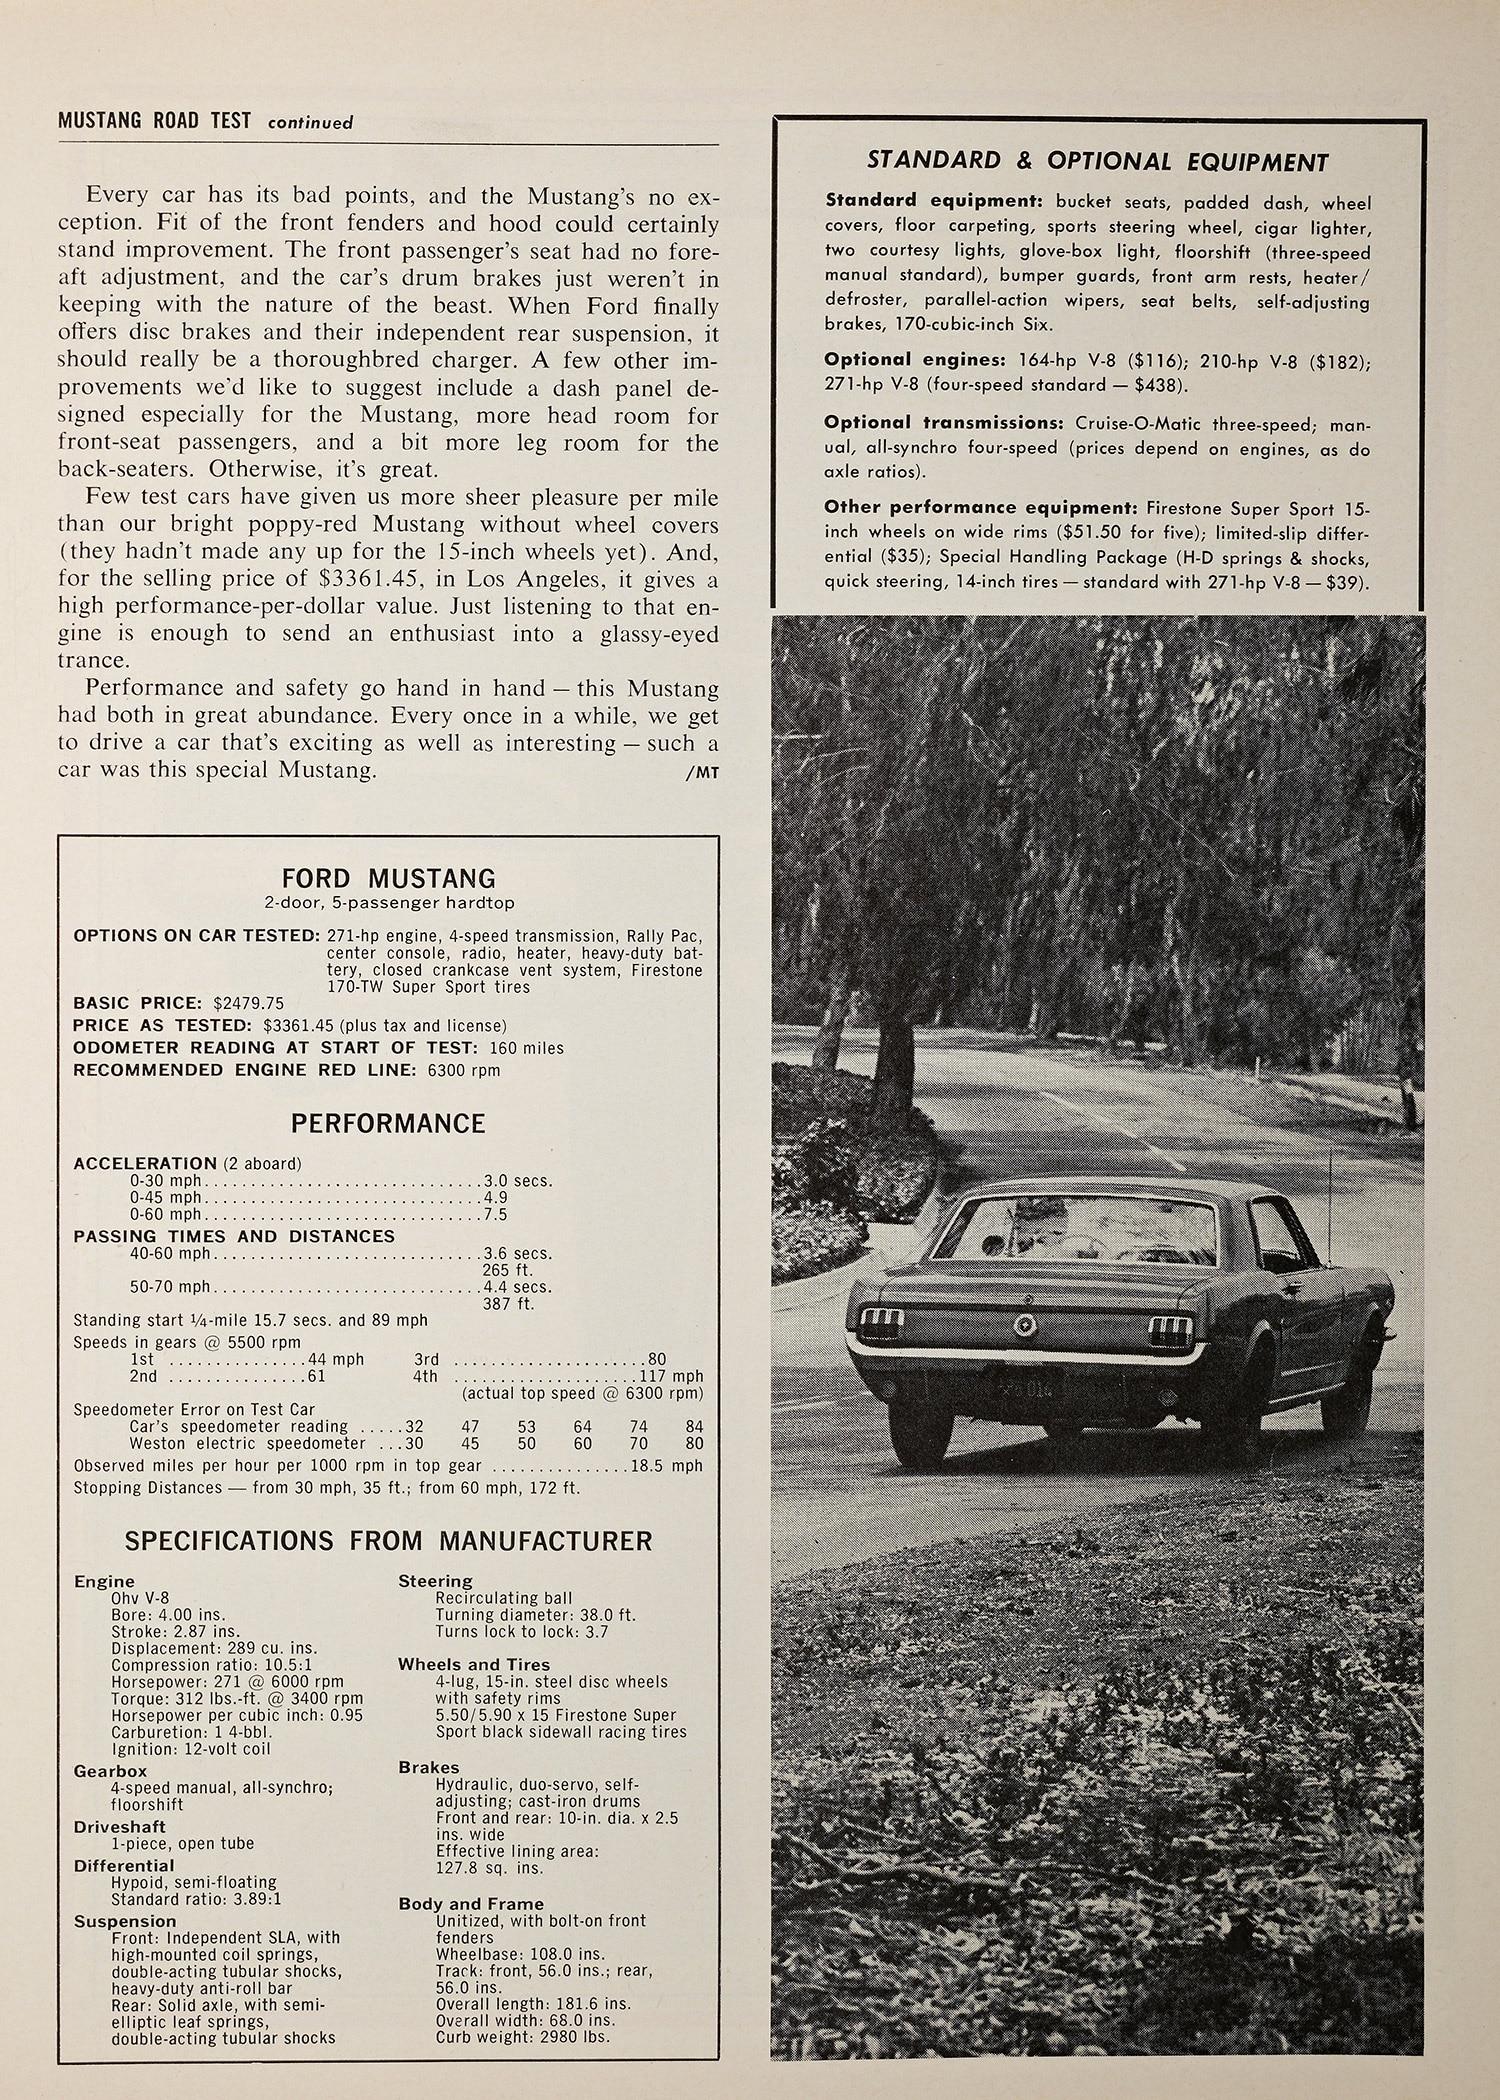 August 1964 Motor Trend Mustang Road Test Specs